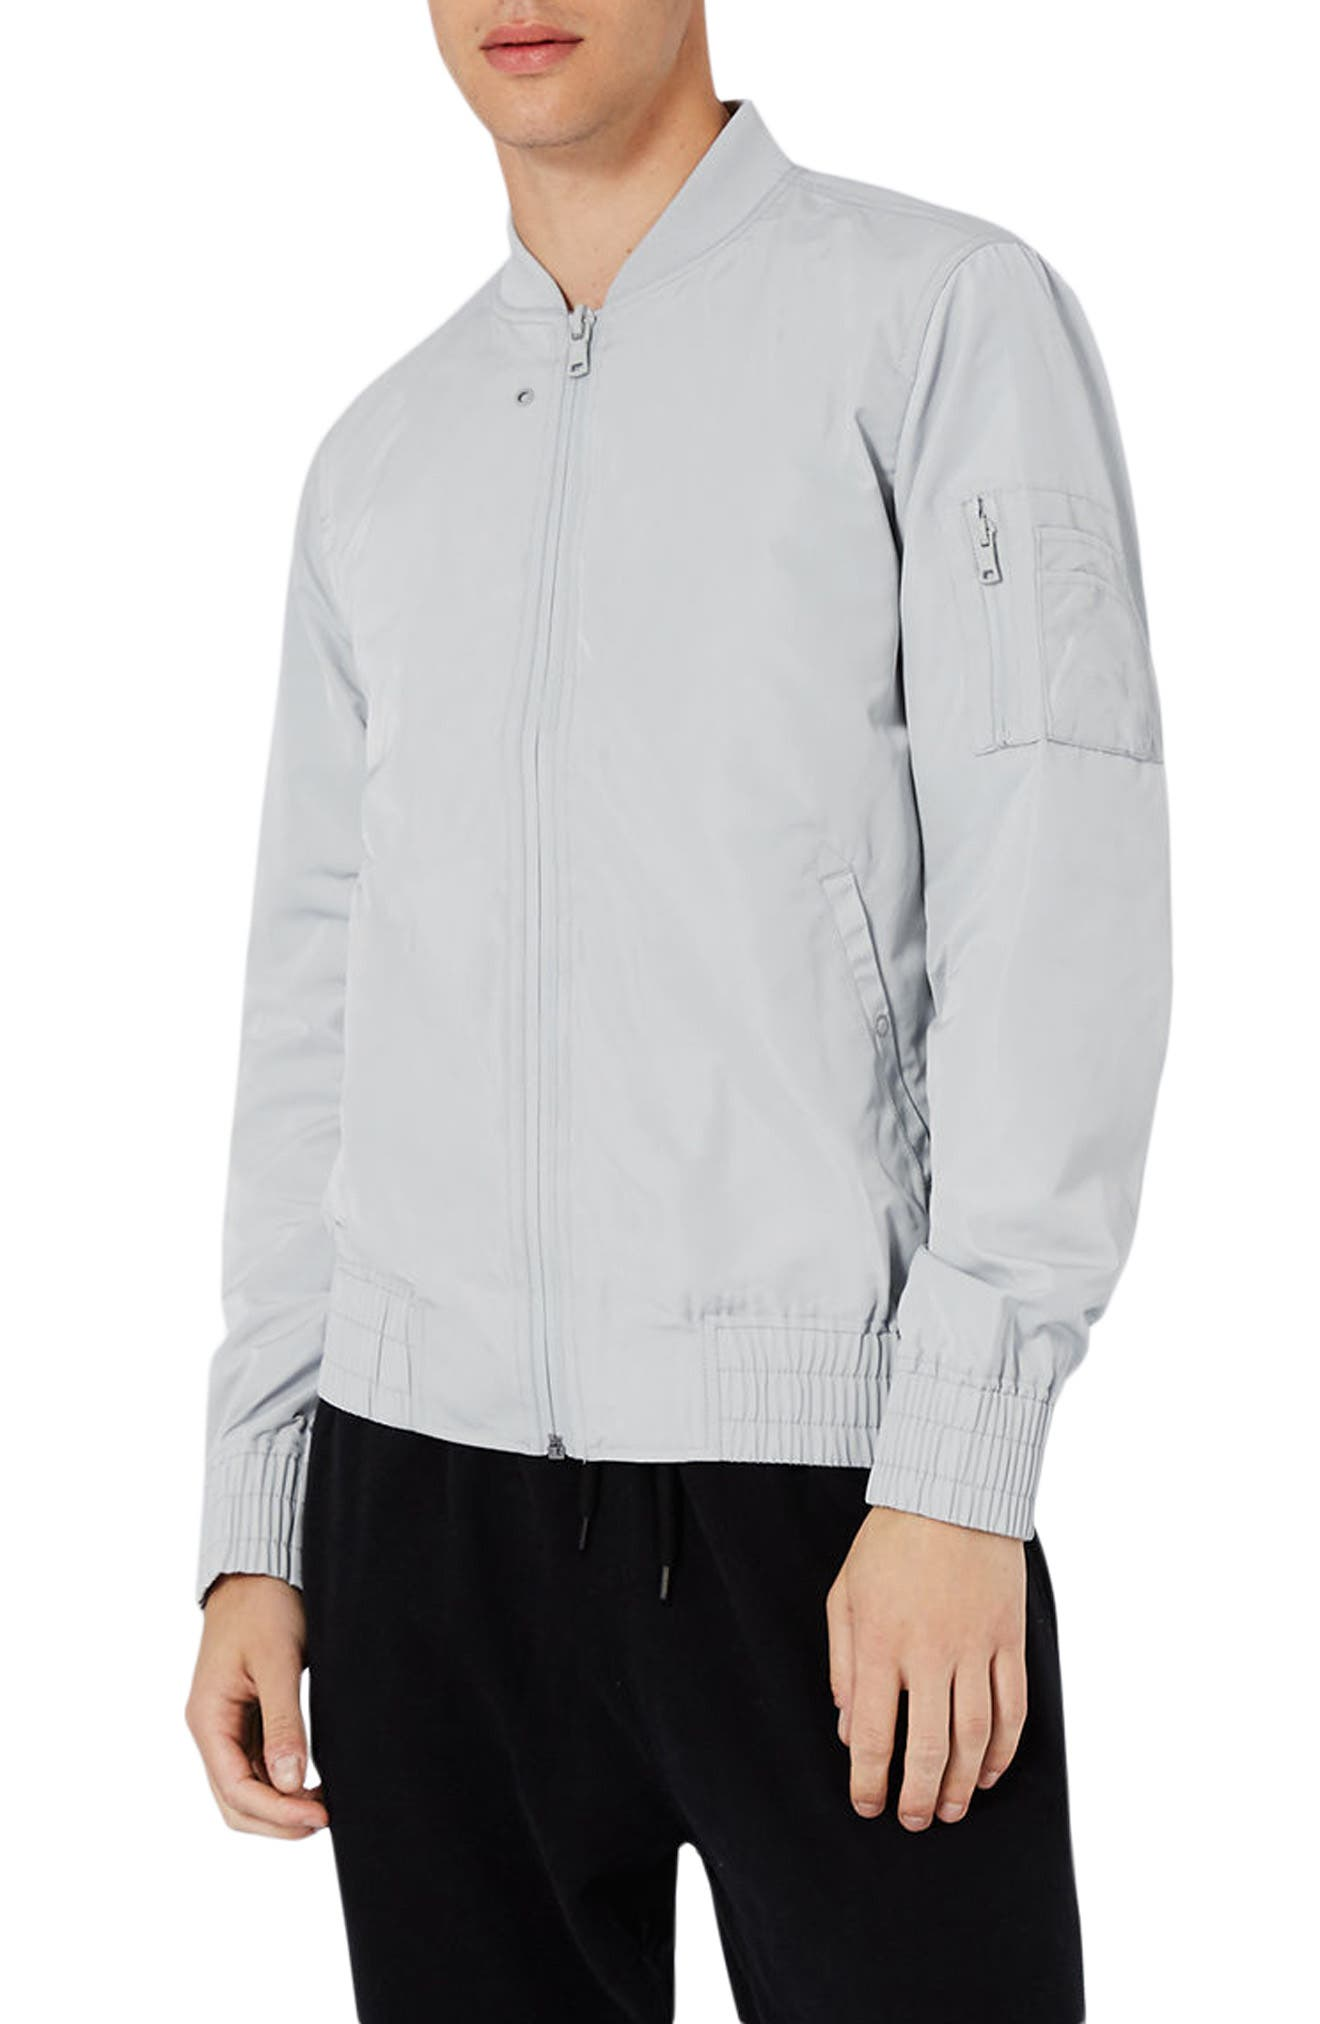 Elton Bomber Jacket,                         Main,                         color, 020